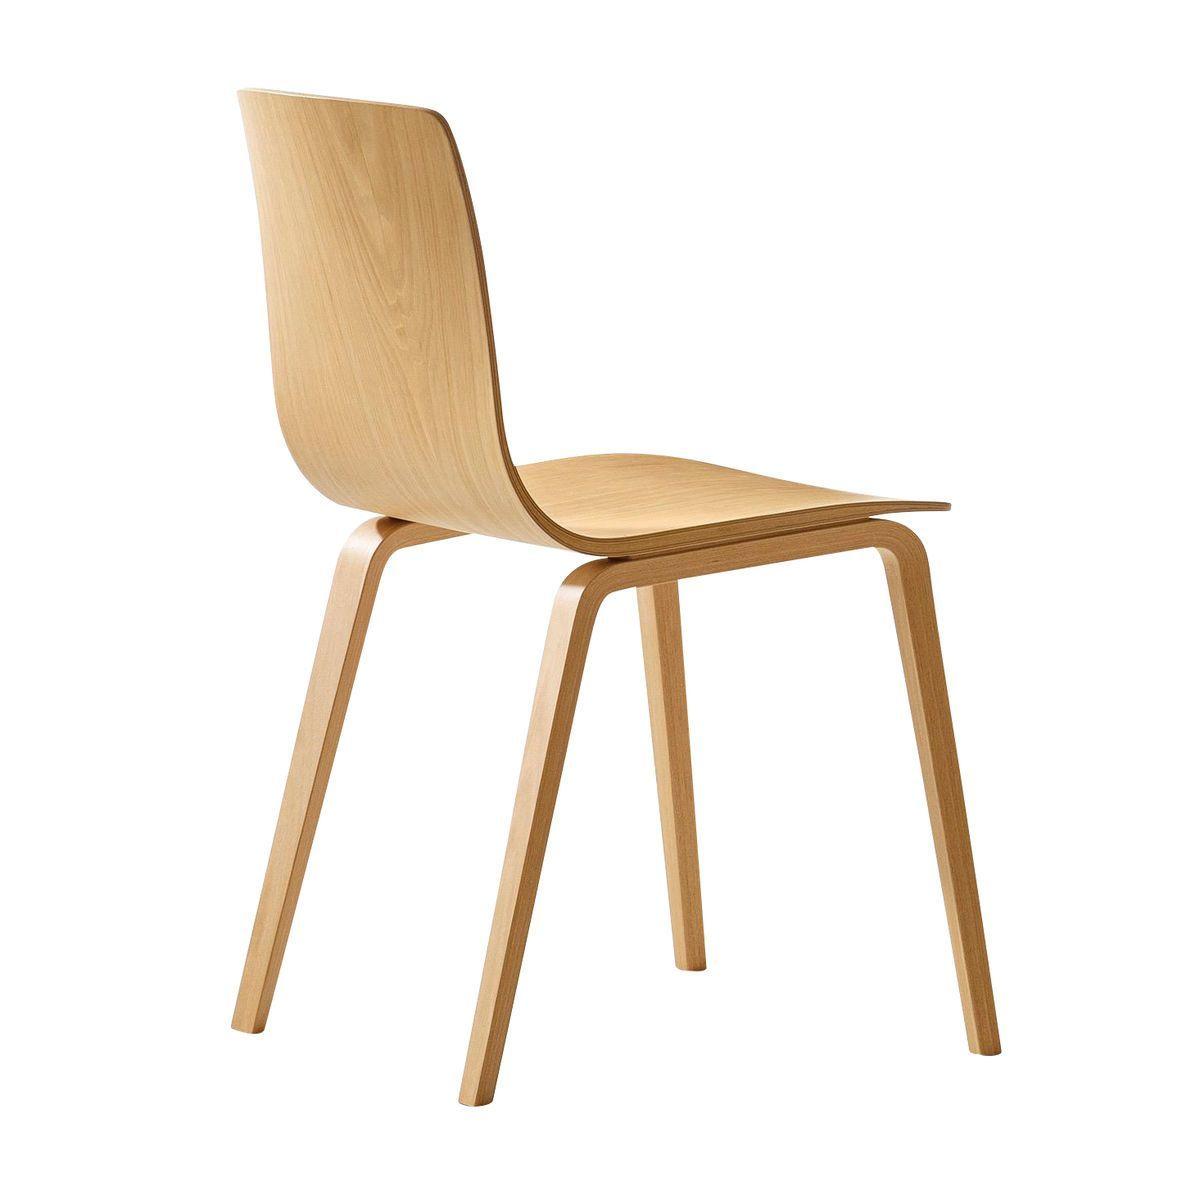 Arper   Aava Chair   Brich Natural